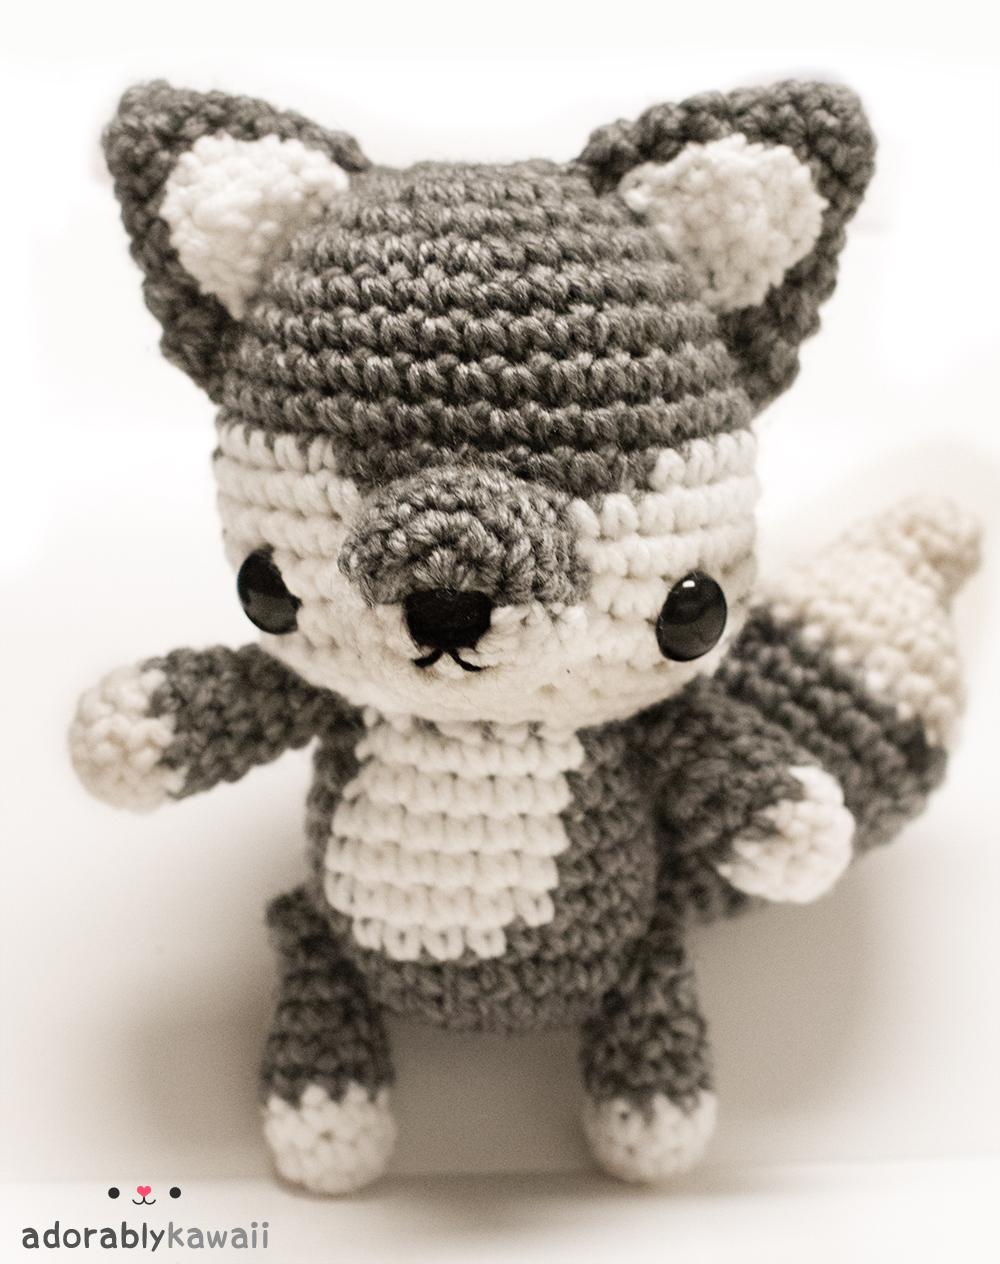 Amigurumi Patterns Wolf : Adorably kawaii baby wolf amigurumi pattern